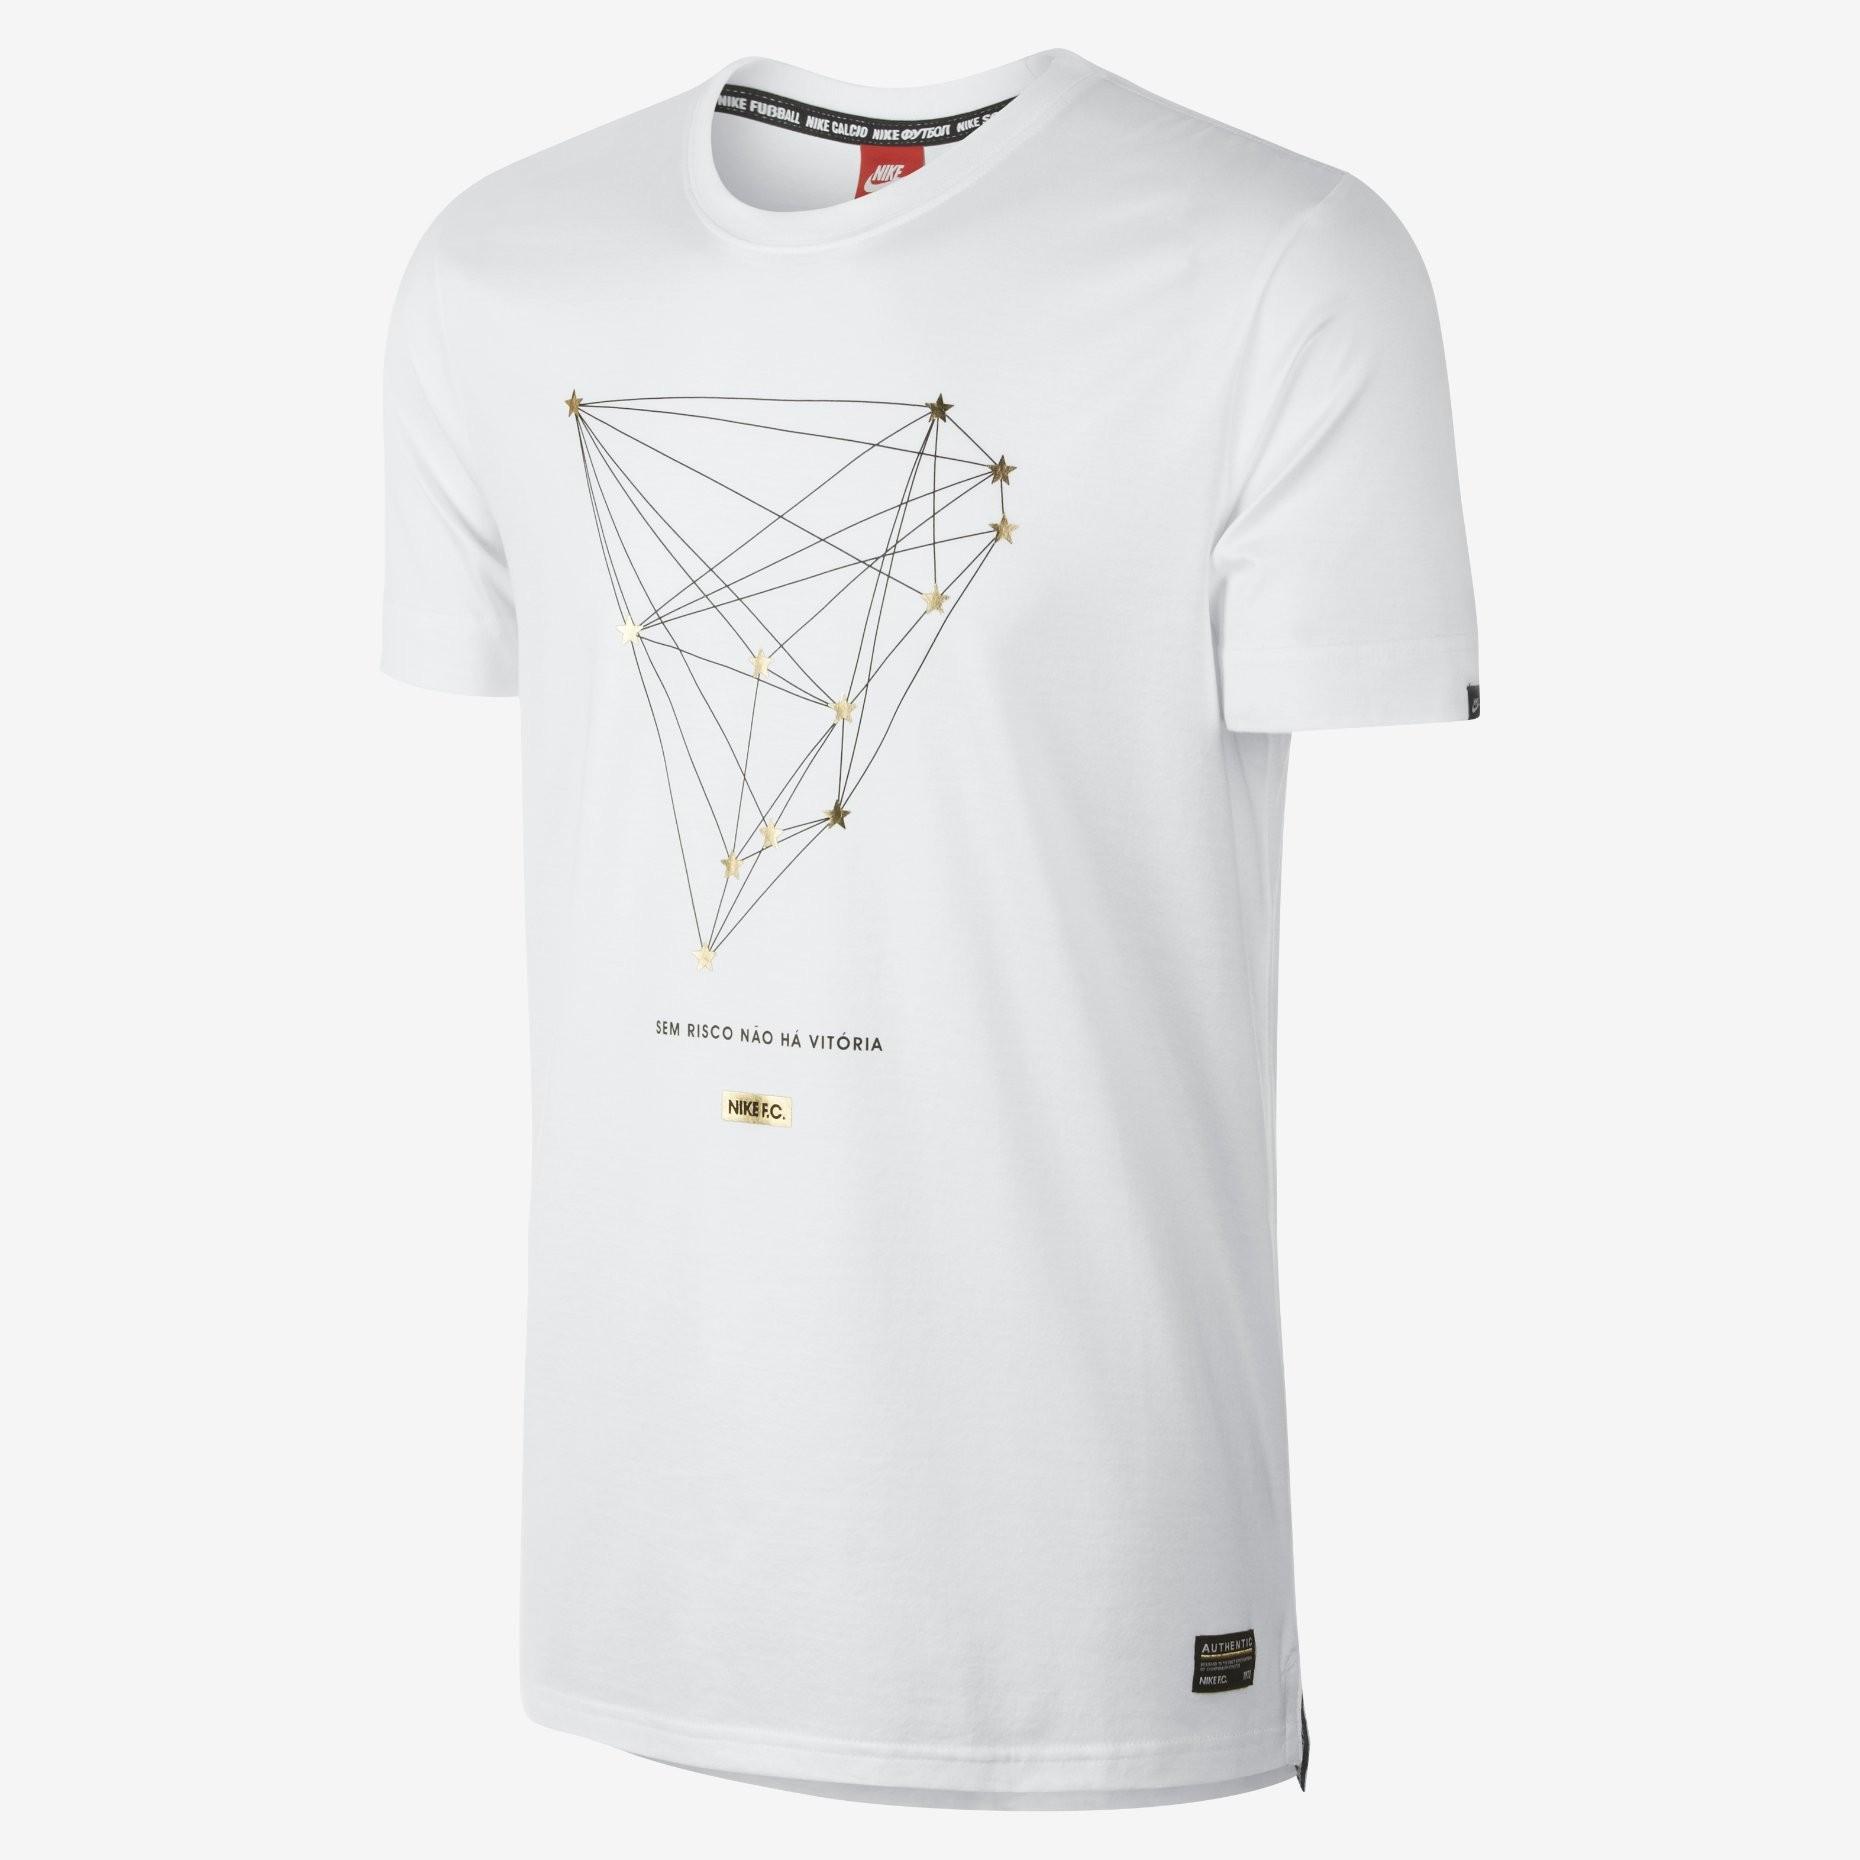 Adulto 100 Map Stars 635409 Camiseta F c Nike q4Xww8A